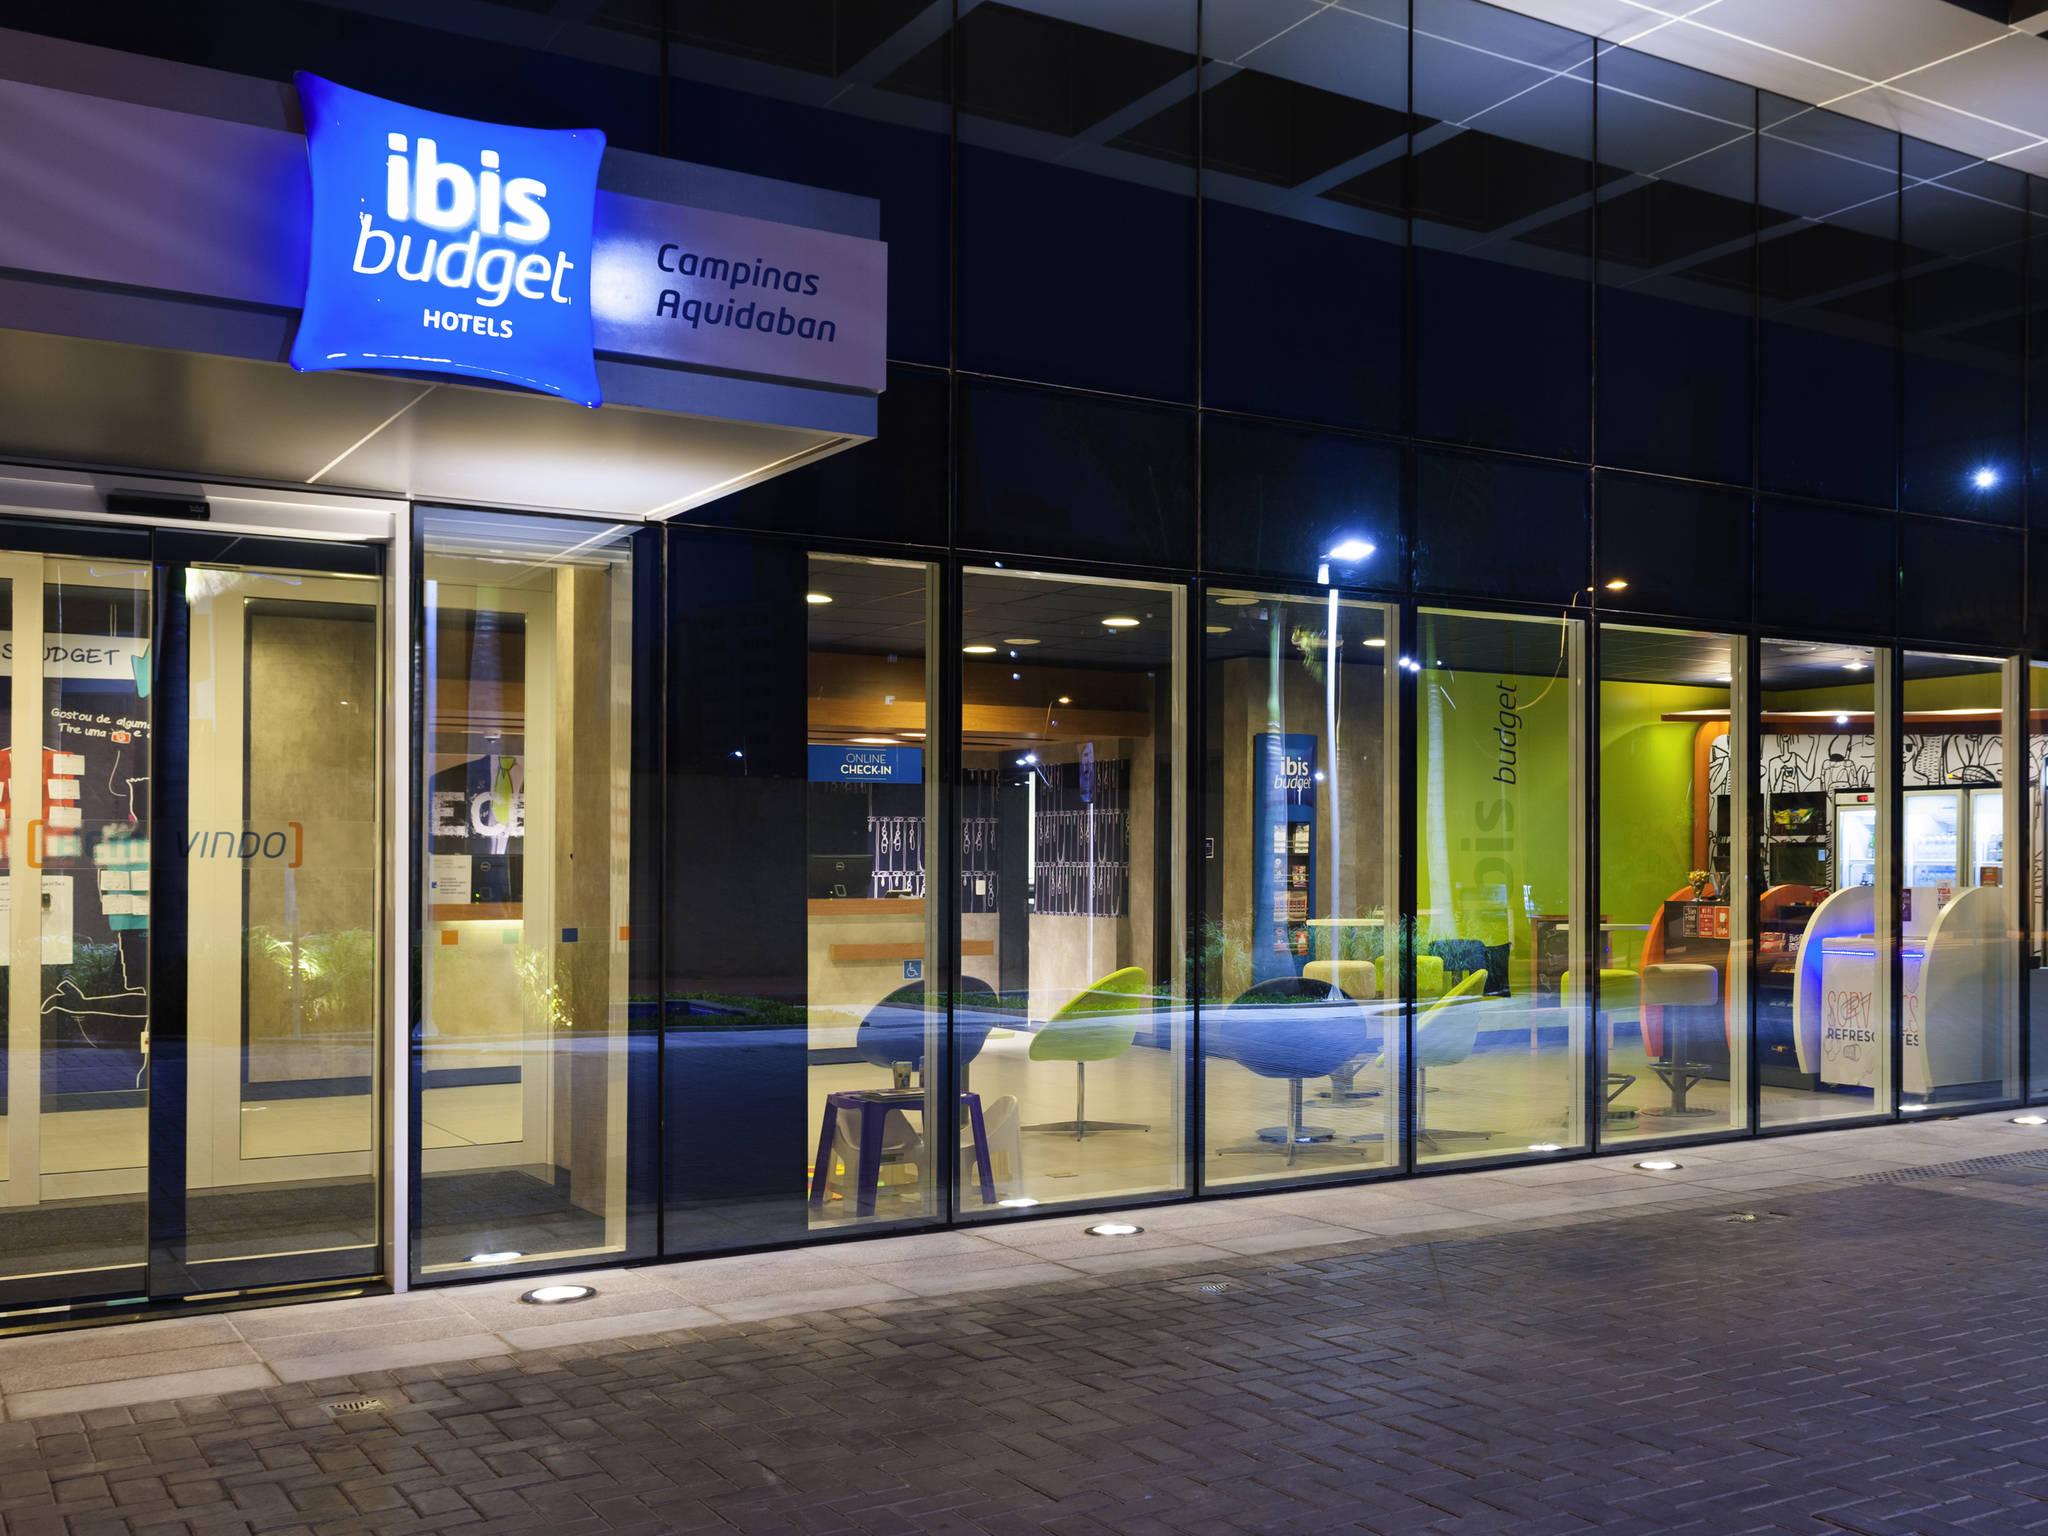 Hotell – ibis budget Campinas Aquidaban